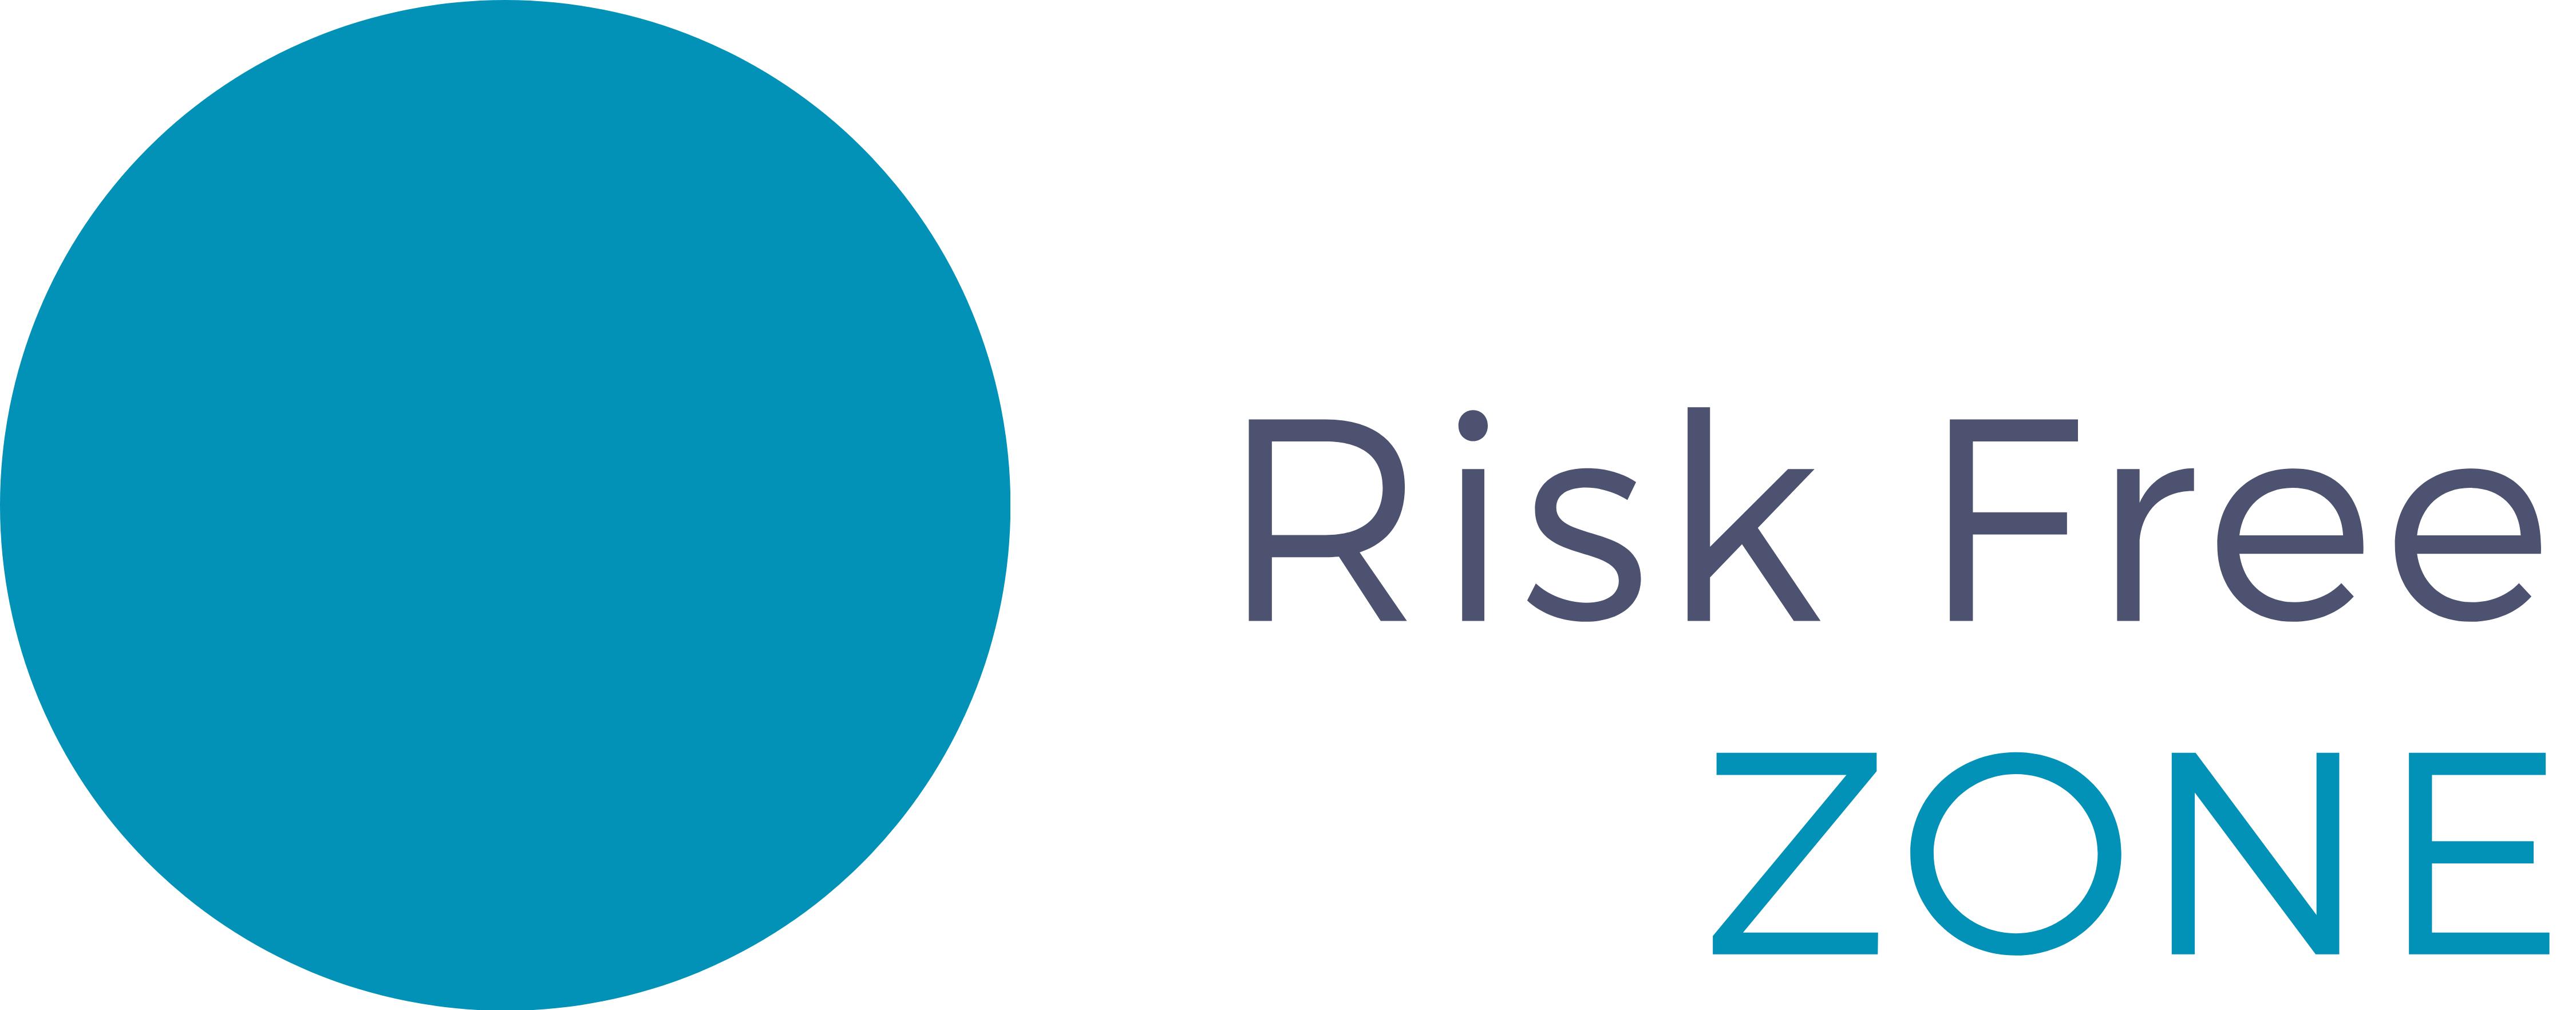 riskfree.zone